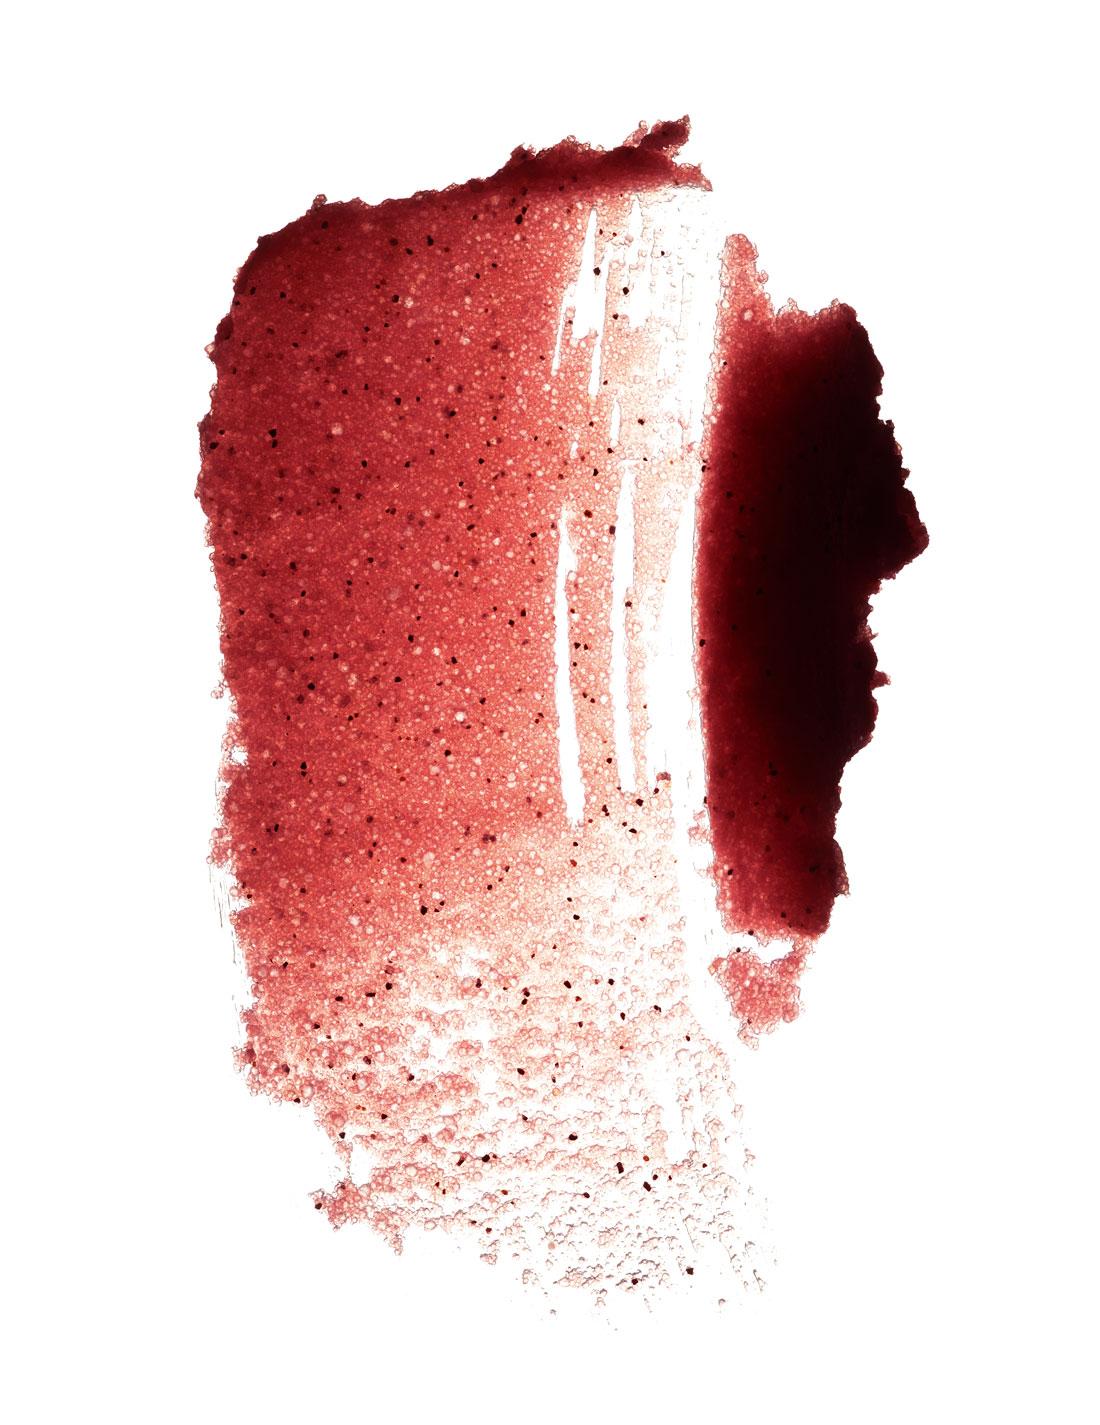 "Huile d'açaí, sucre de canne, graines de maracujá et d'açaí concassées. ""Pulpe Exfoliante à l'Huile d'Açaí, Ekos, NATURA."